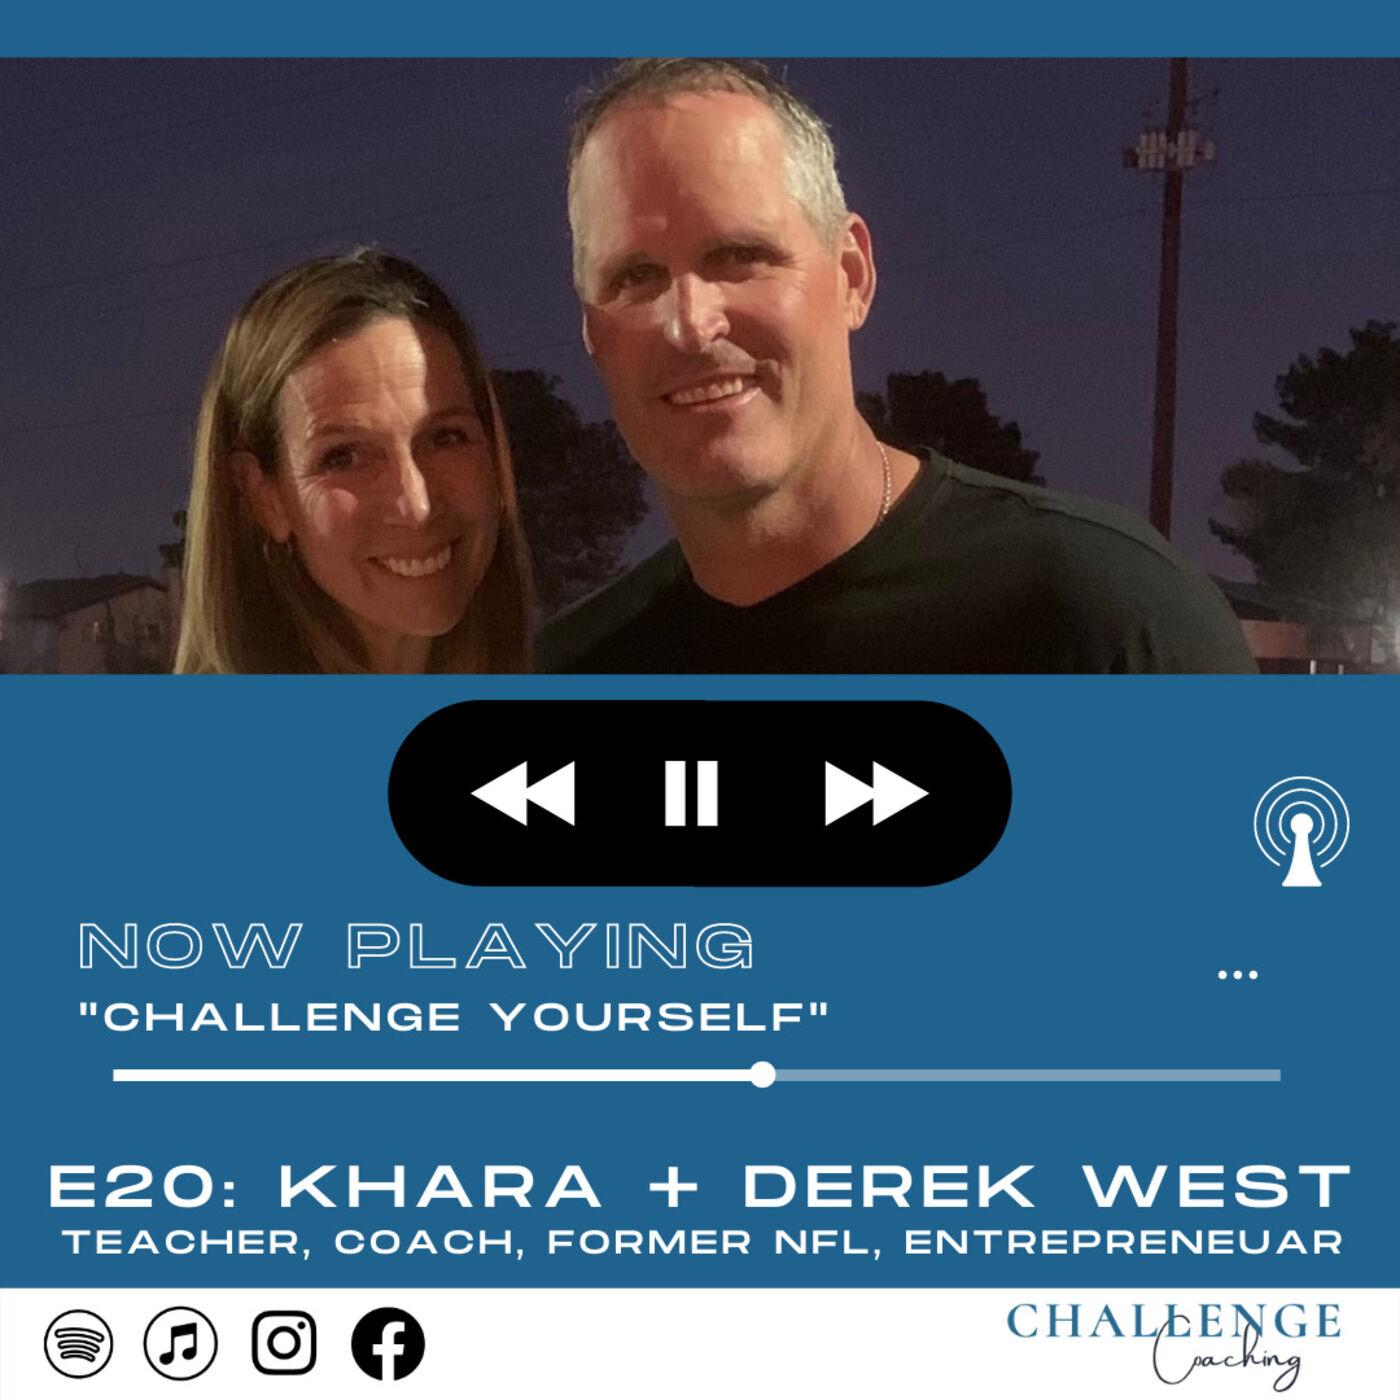 E20: Khara + Derek West: Teacher, Coach, former NFL player & Entrepreneur